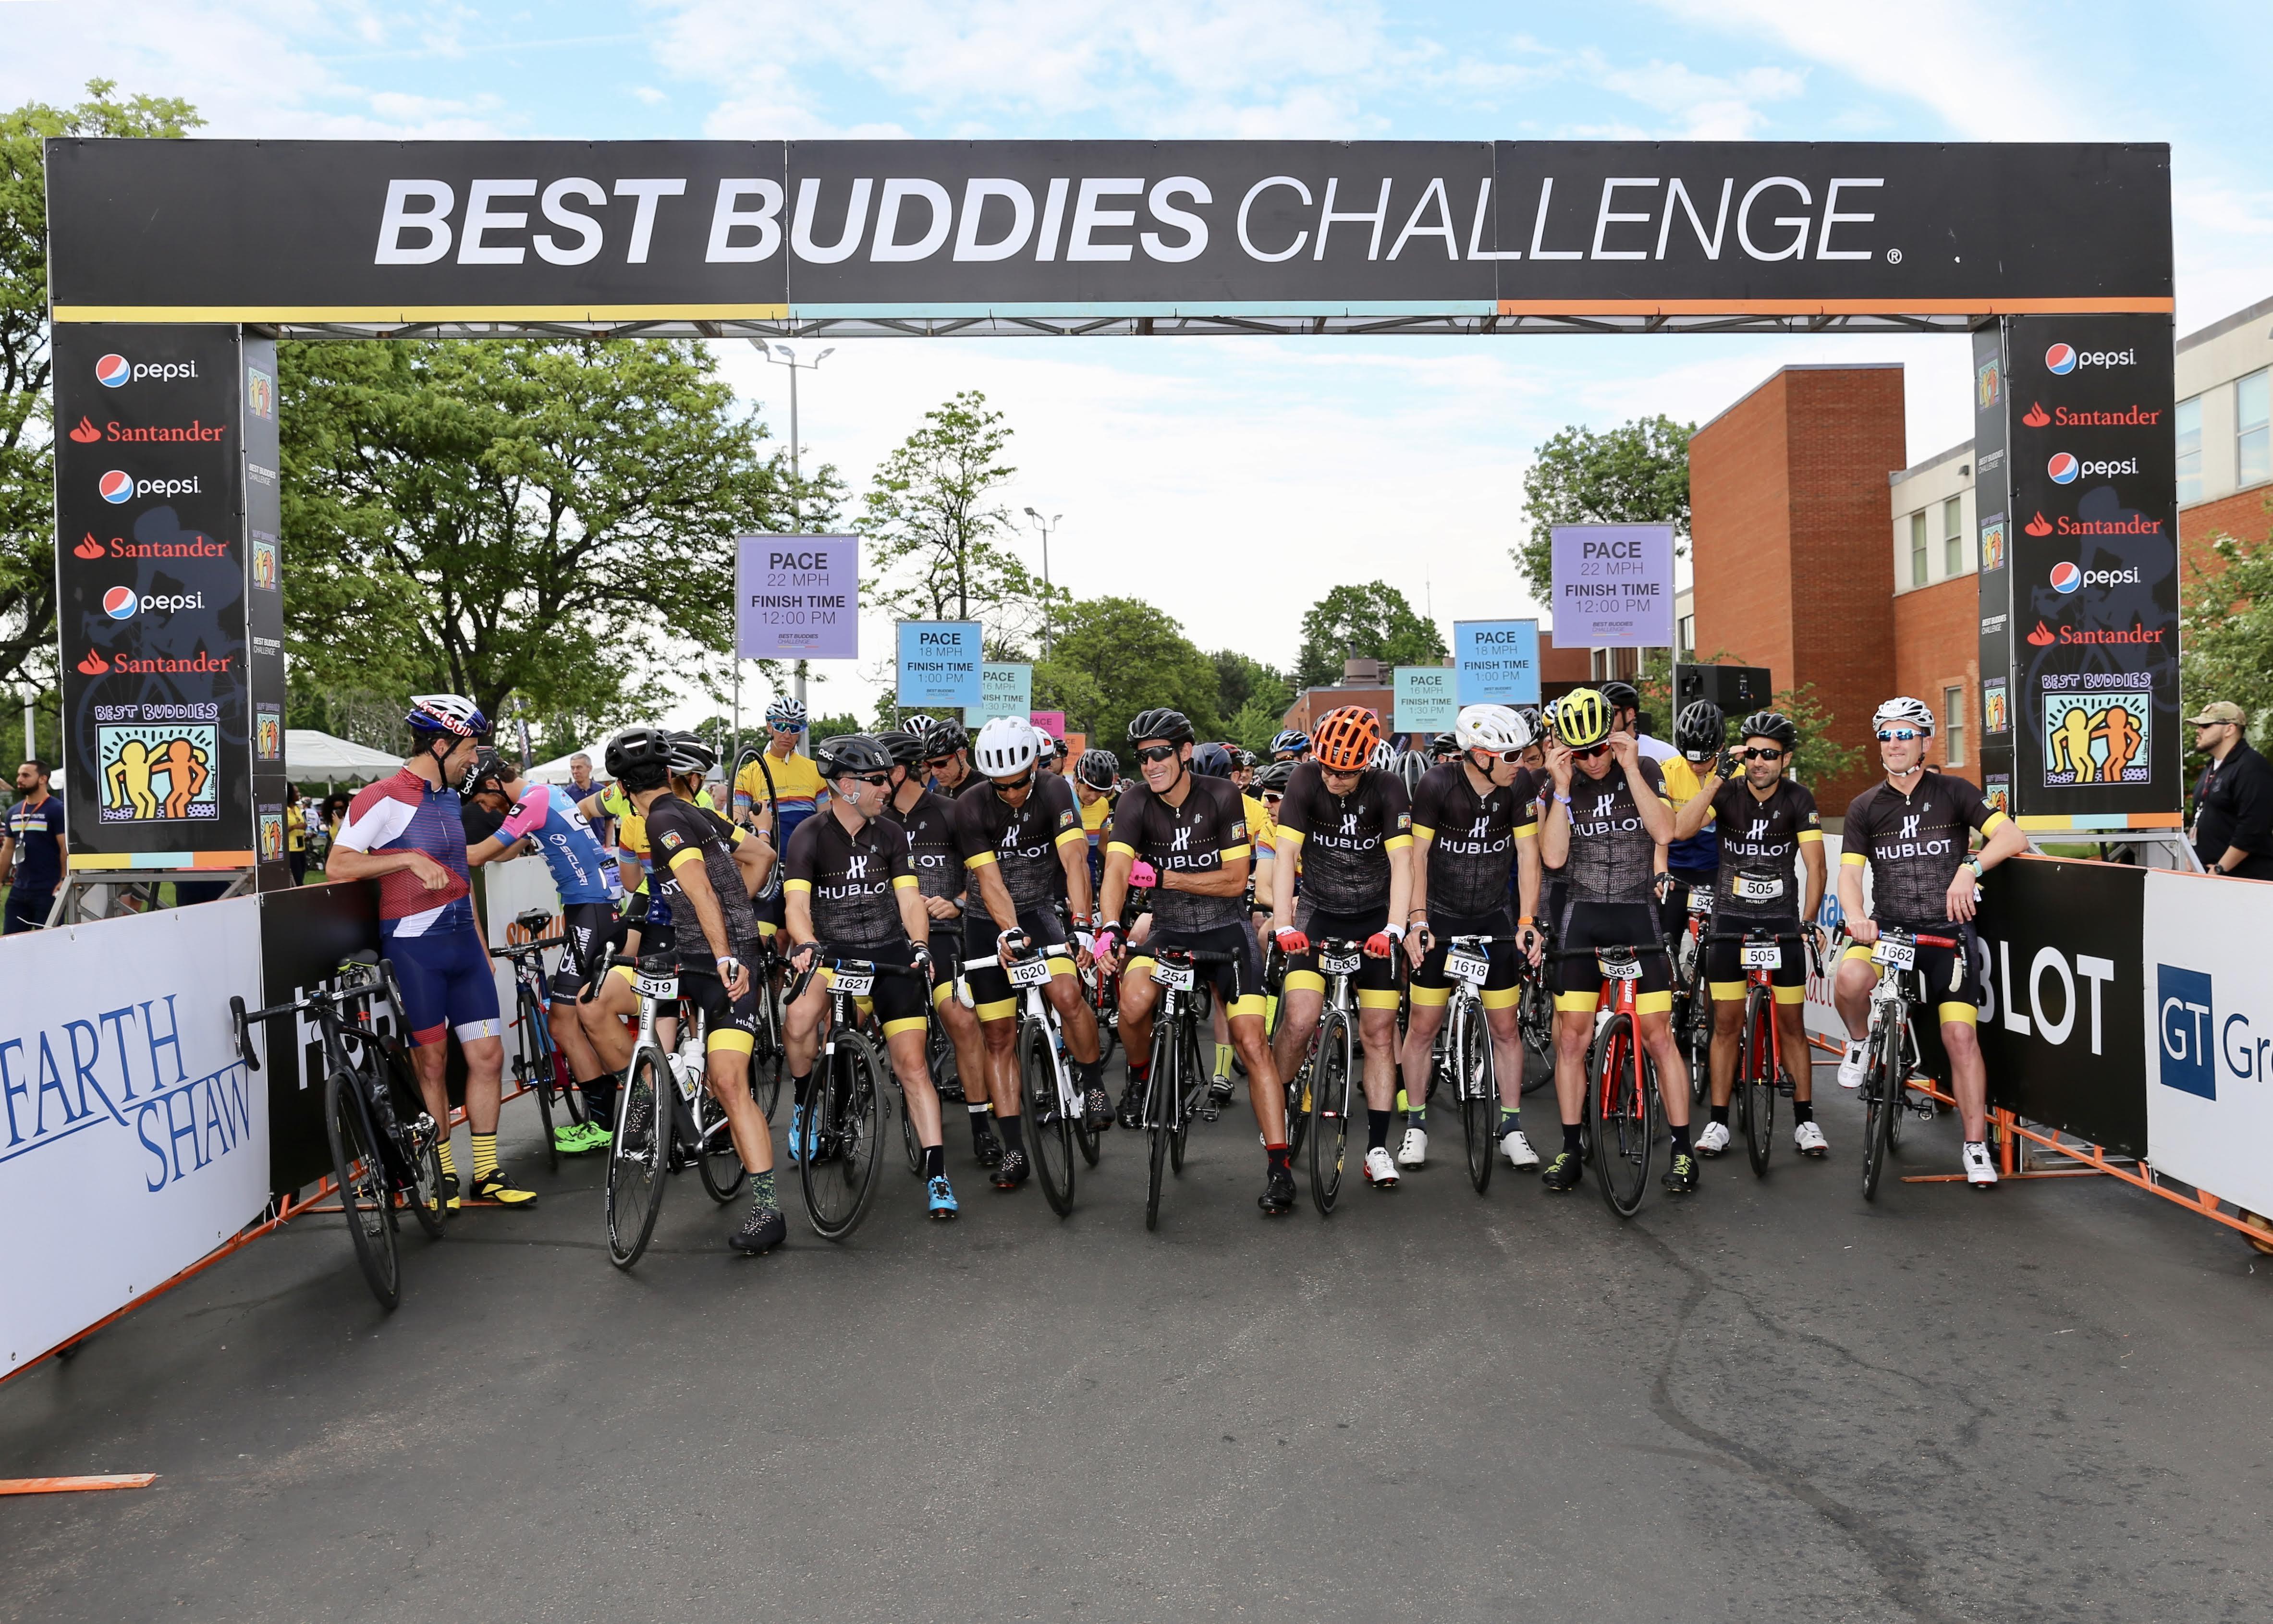 19th Annual Best Buddies Challenge: Hyannis Port Presented by Pepsi